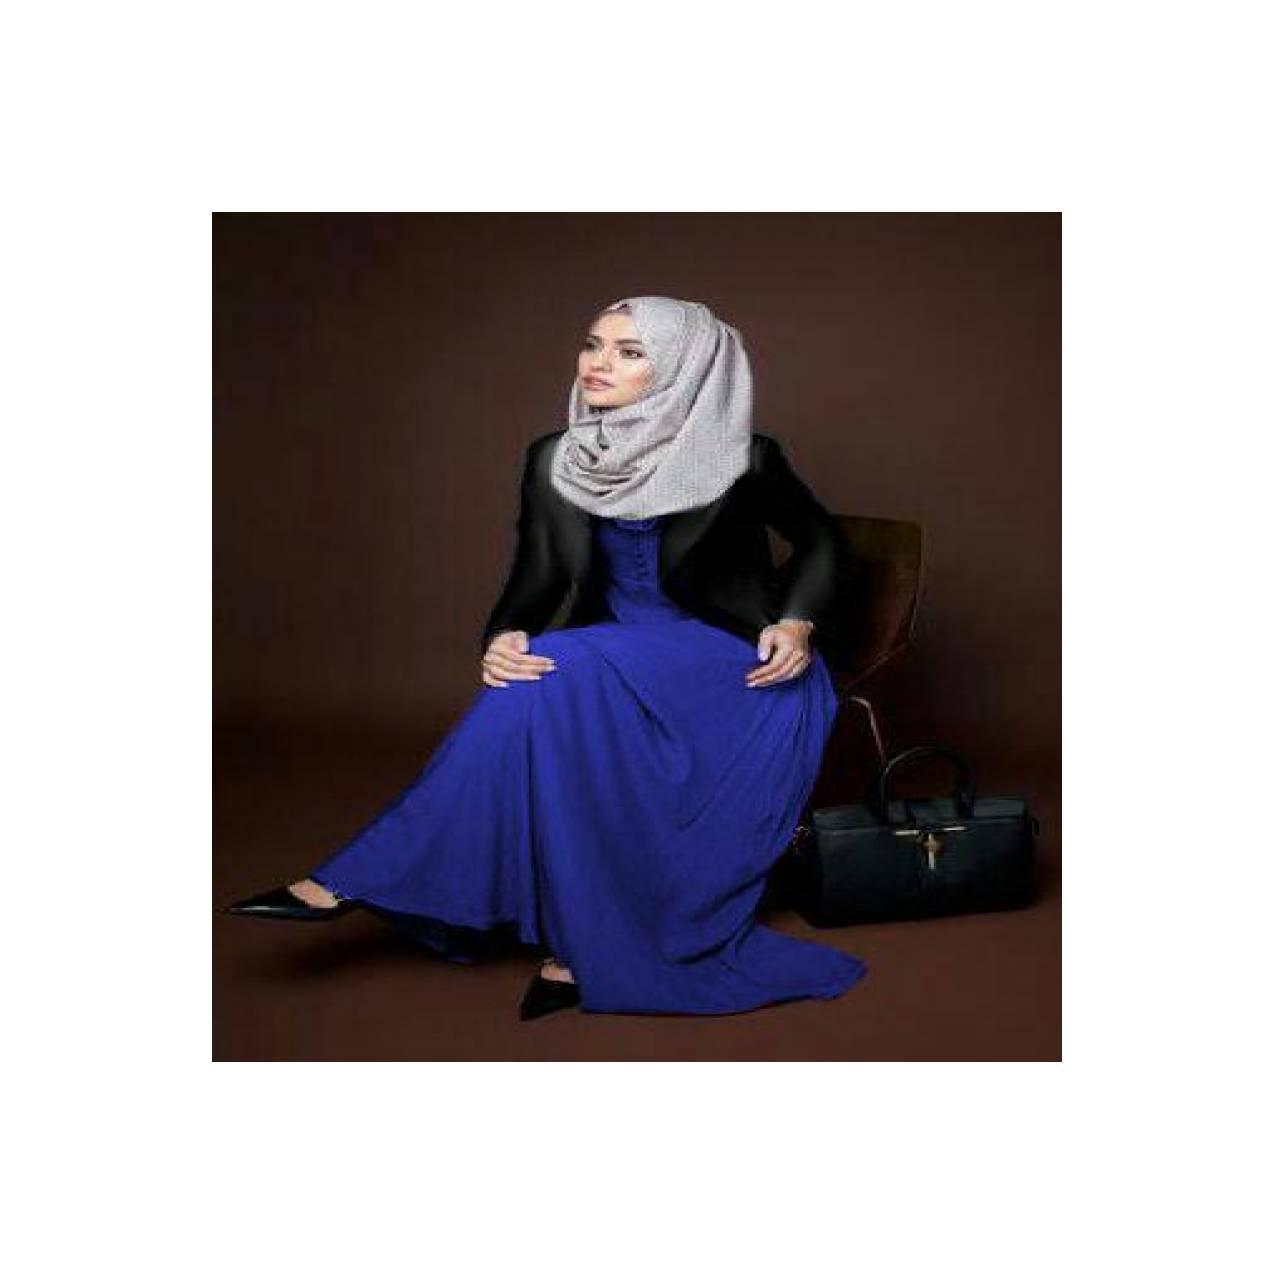 Furla Blue Set Hijab 3 In 1 u/ wanita anak hijabers modis halus nyaman